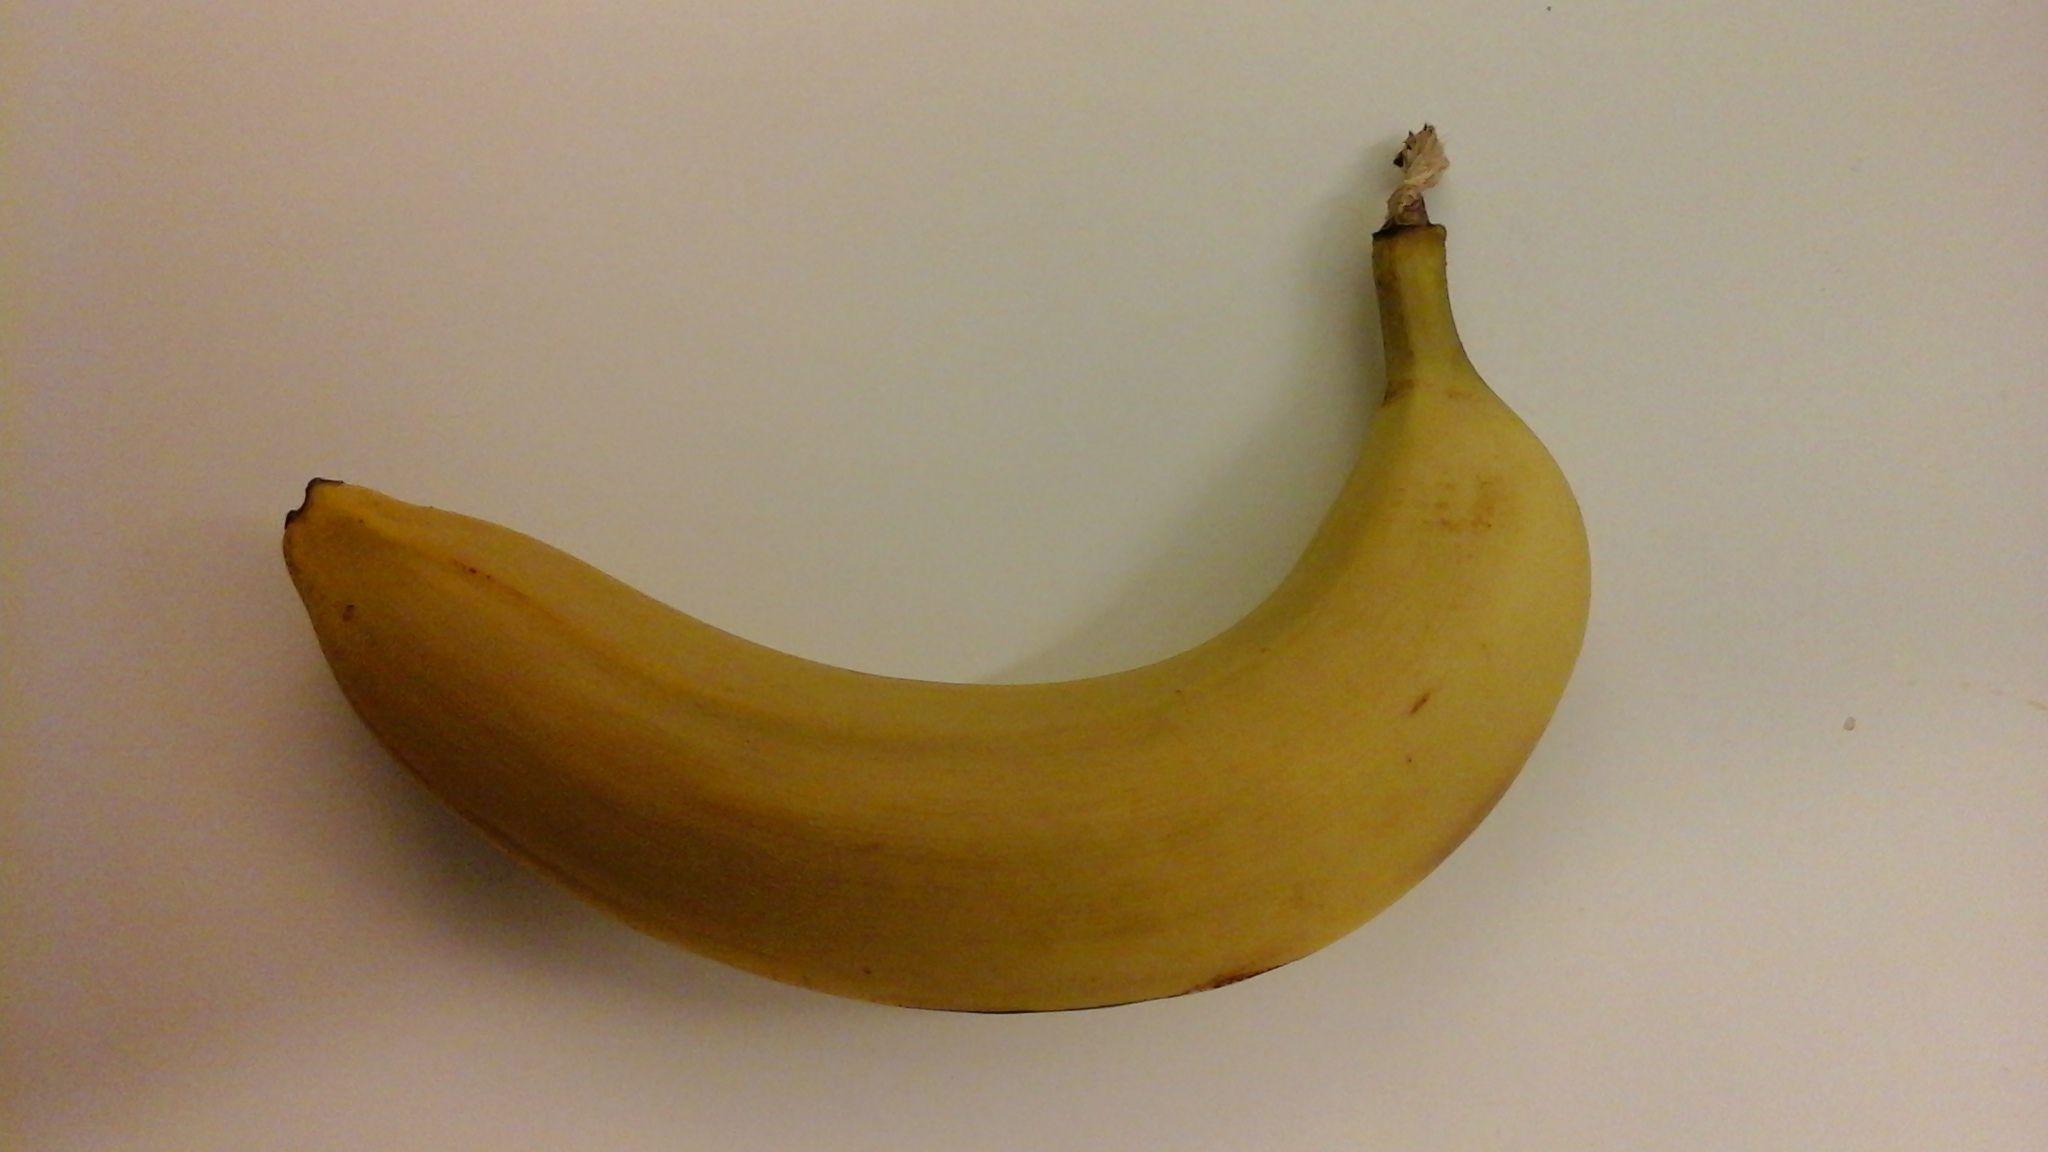 Her har vi brukt Galaxy Tab Actives premiumkamera til å dokumentere en banan. Foto: Finn Jarle Kvalheim, Tek.no